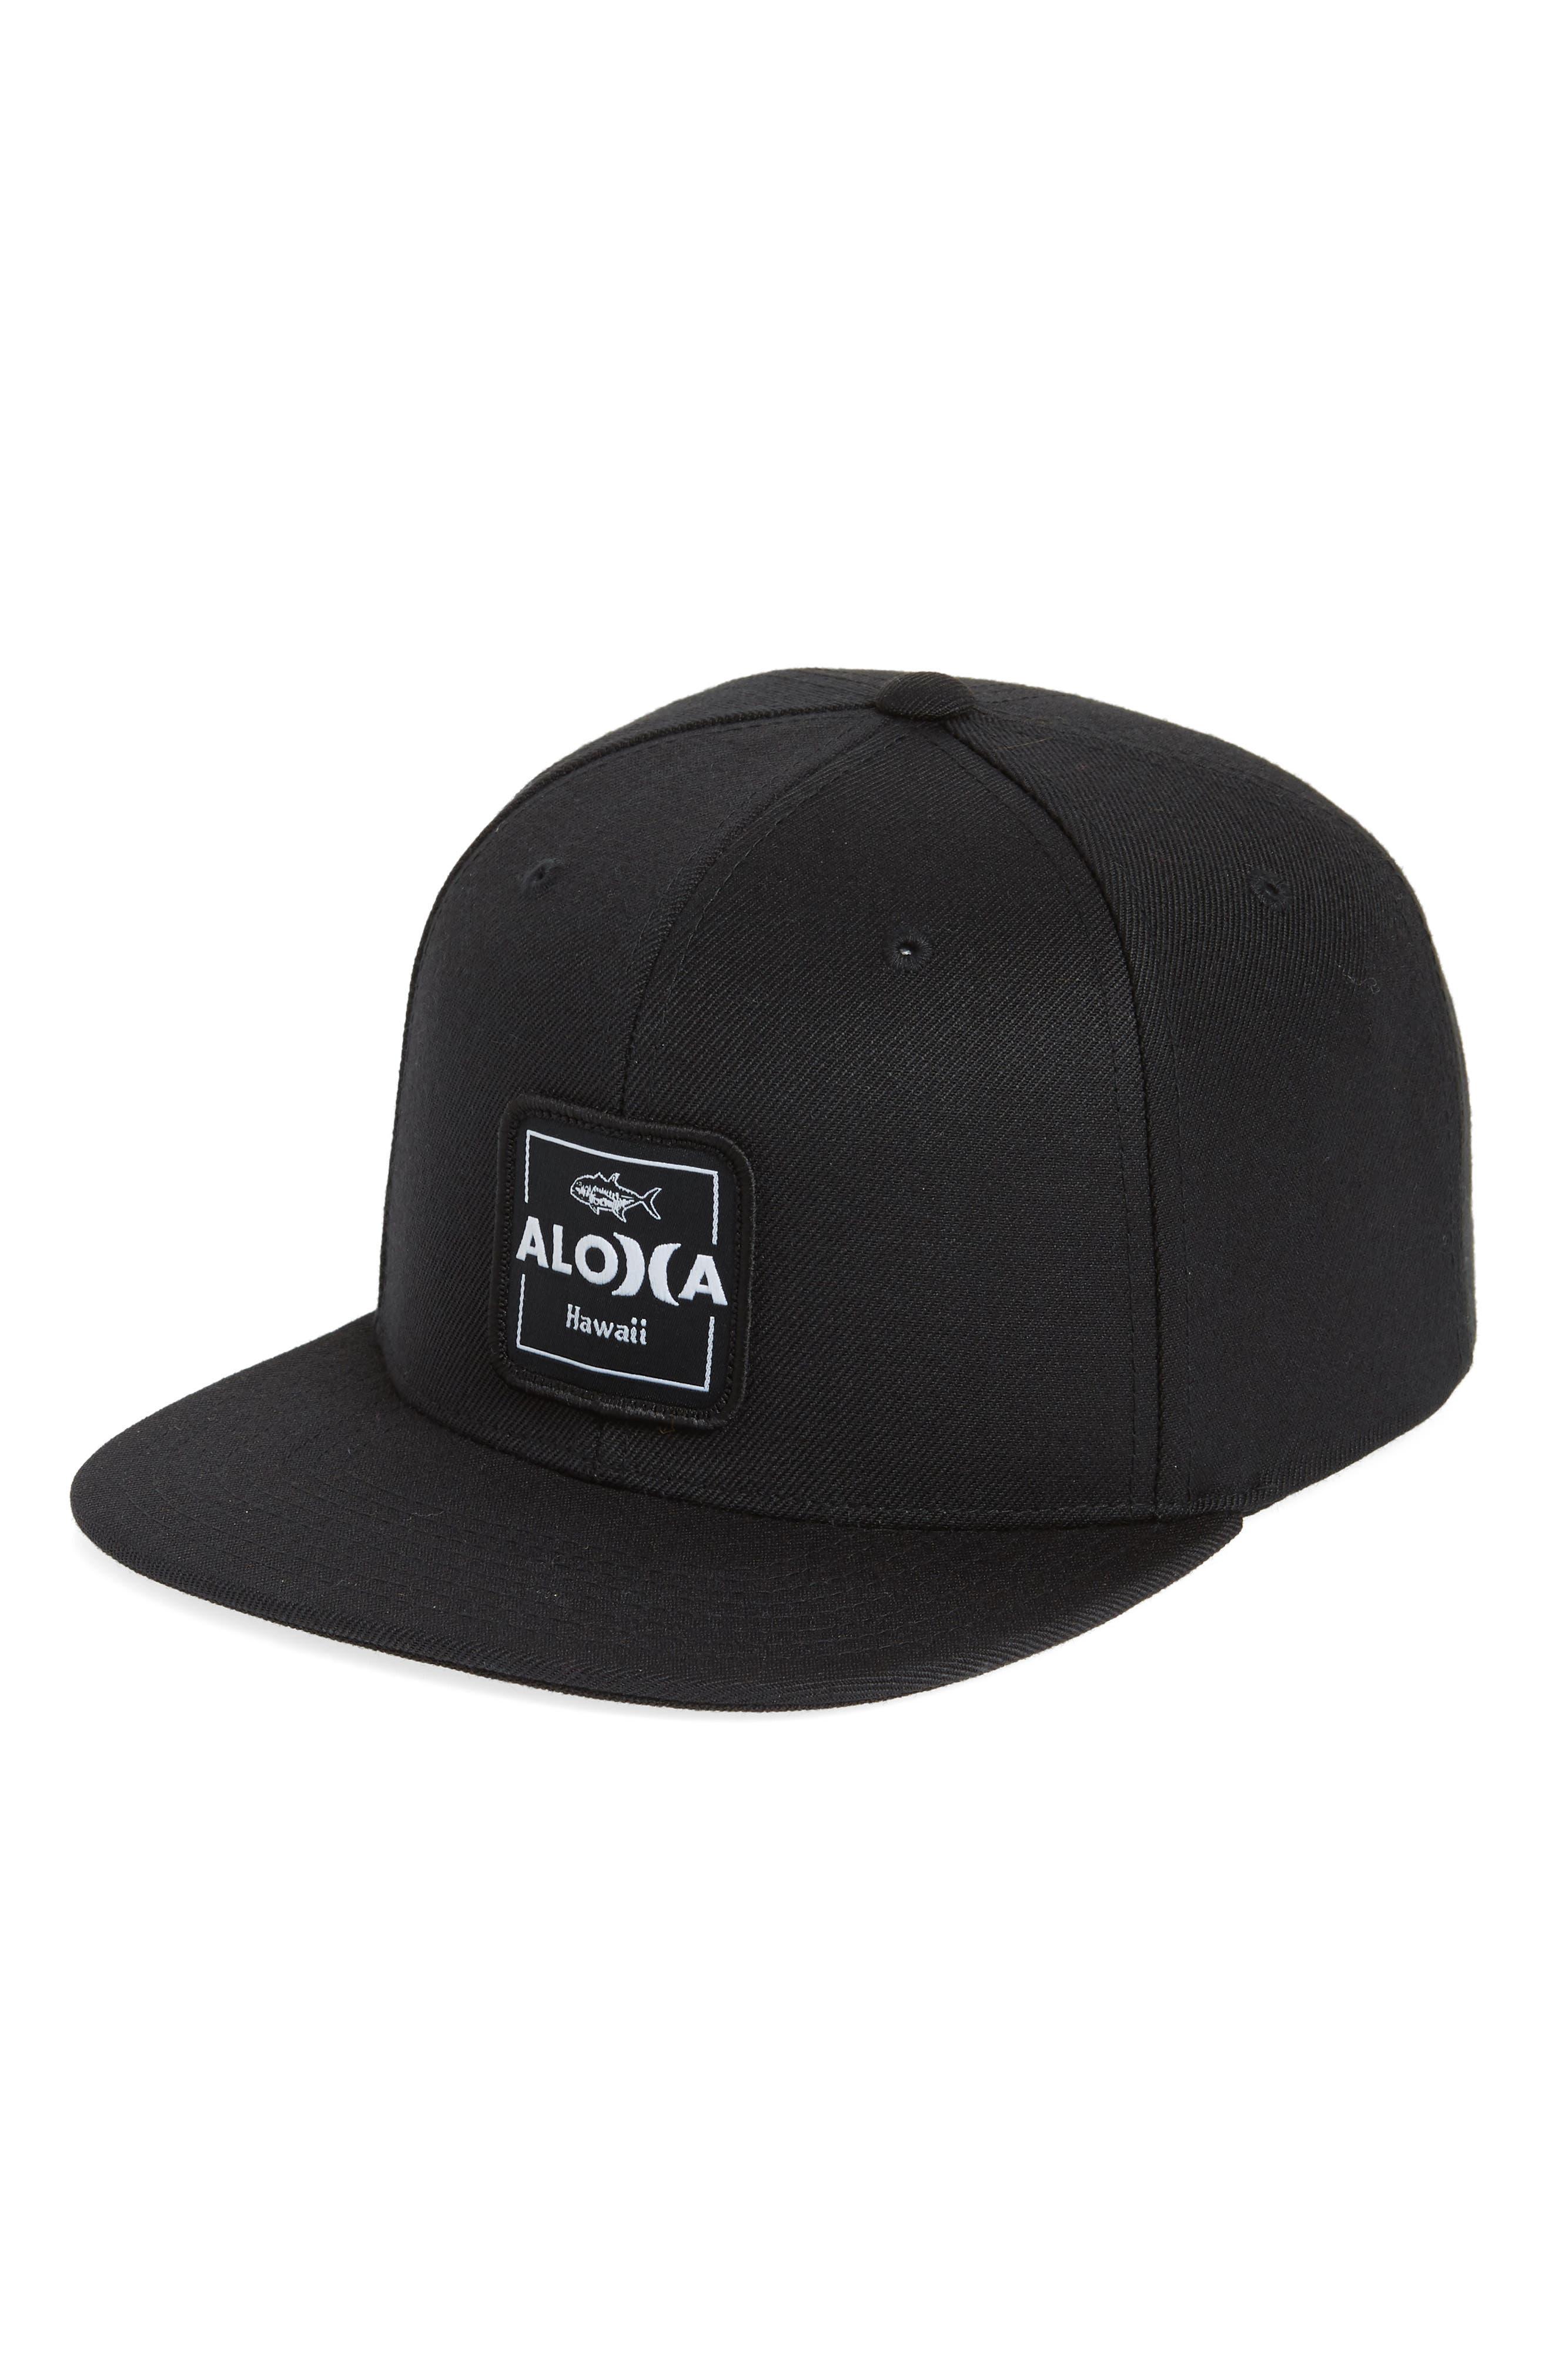 Aloha Cruiser 2 Cap,                         Main,                         color, Black